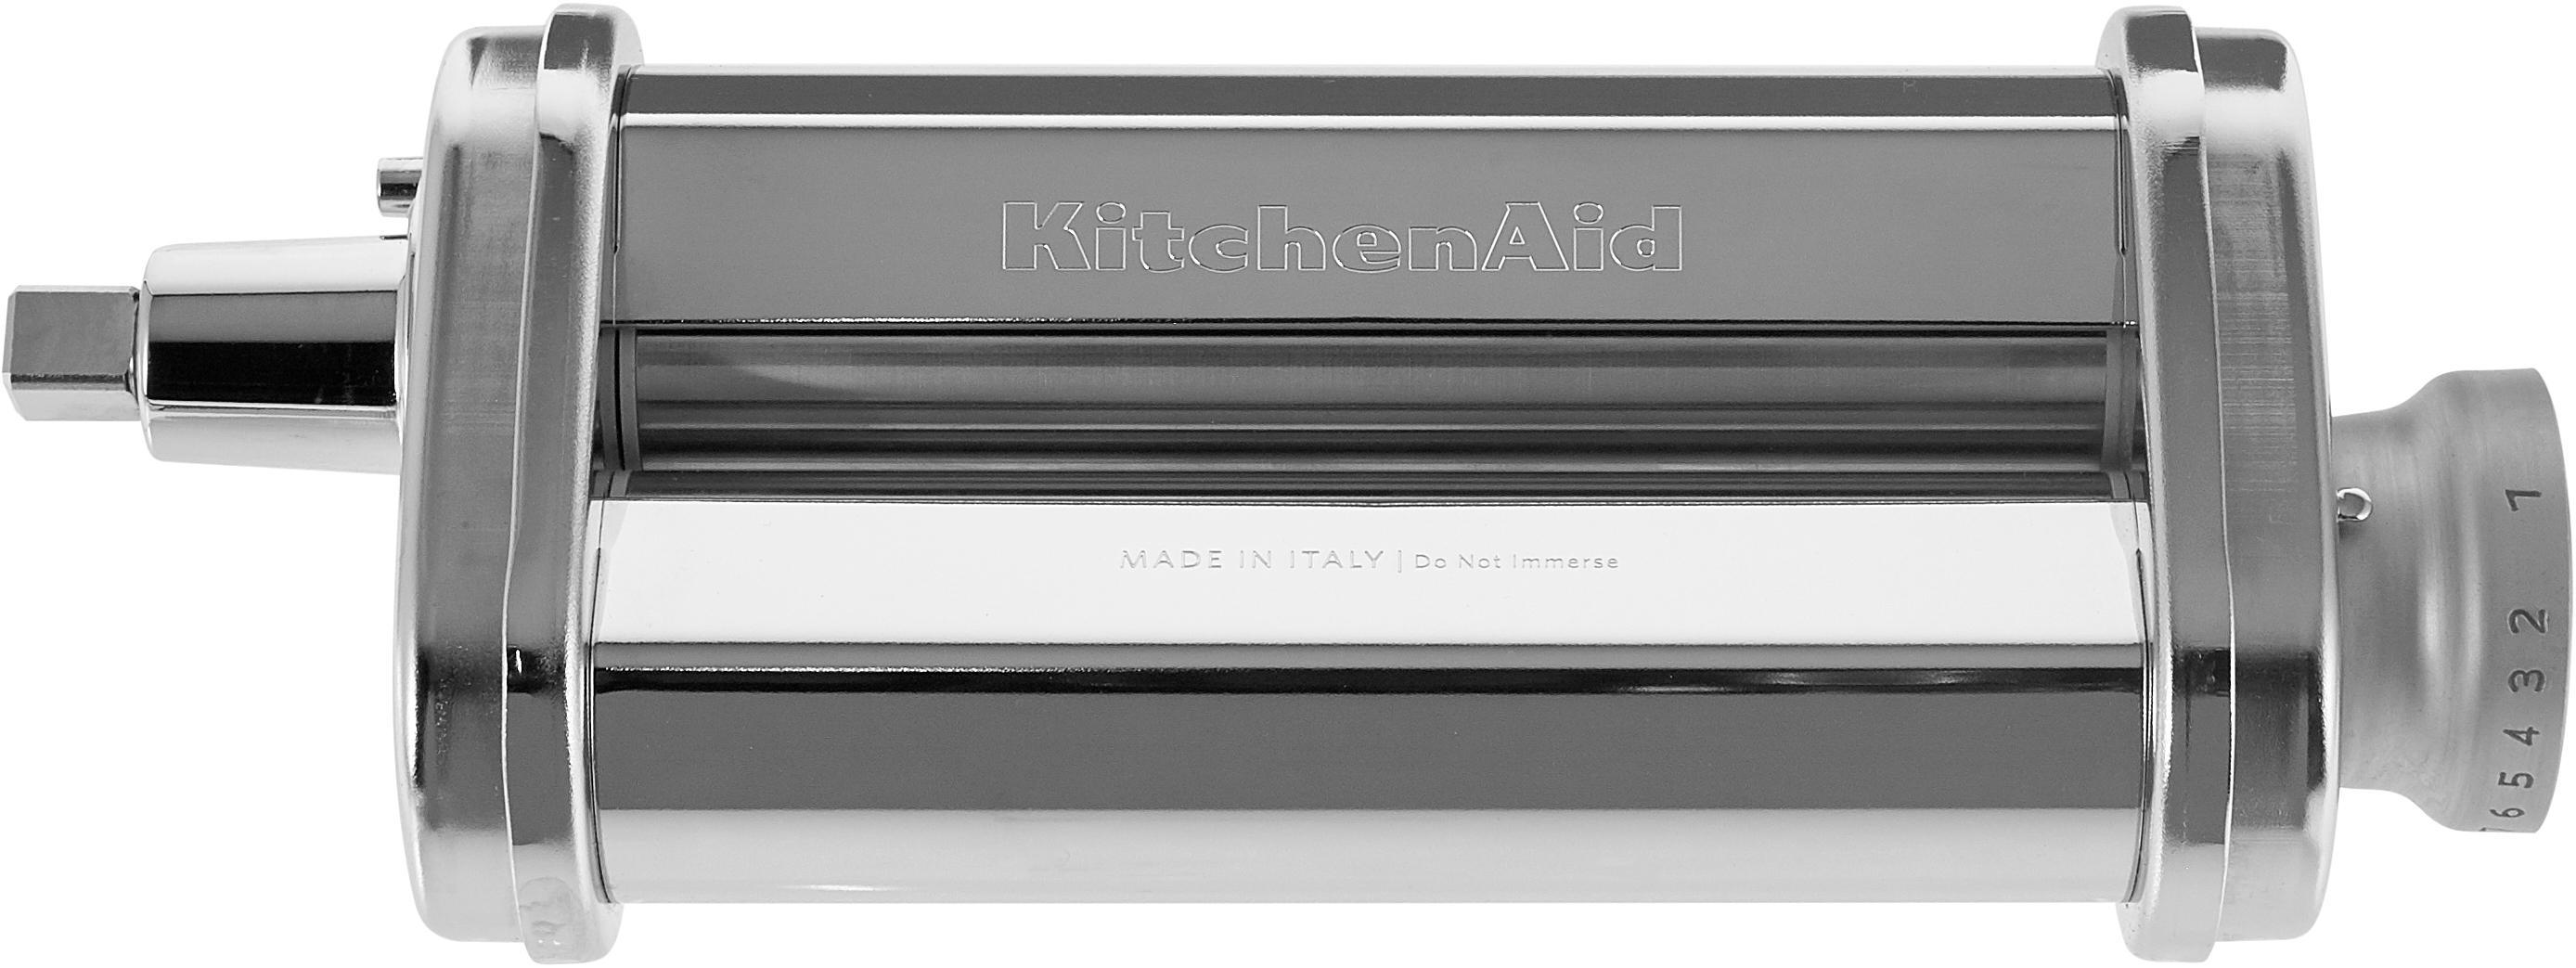 Nudel-Aufsatz-Set Artisan, 4-tlg., Edelstahl, Edelstahl, 25 x 10 cm